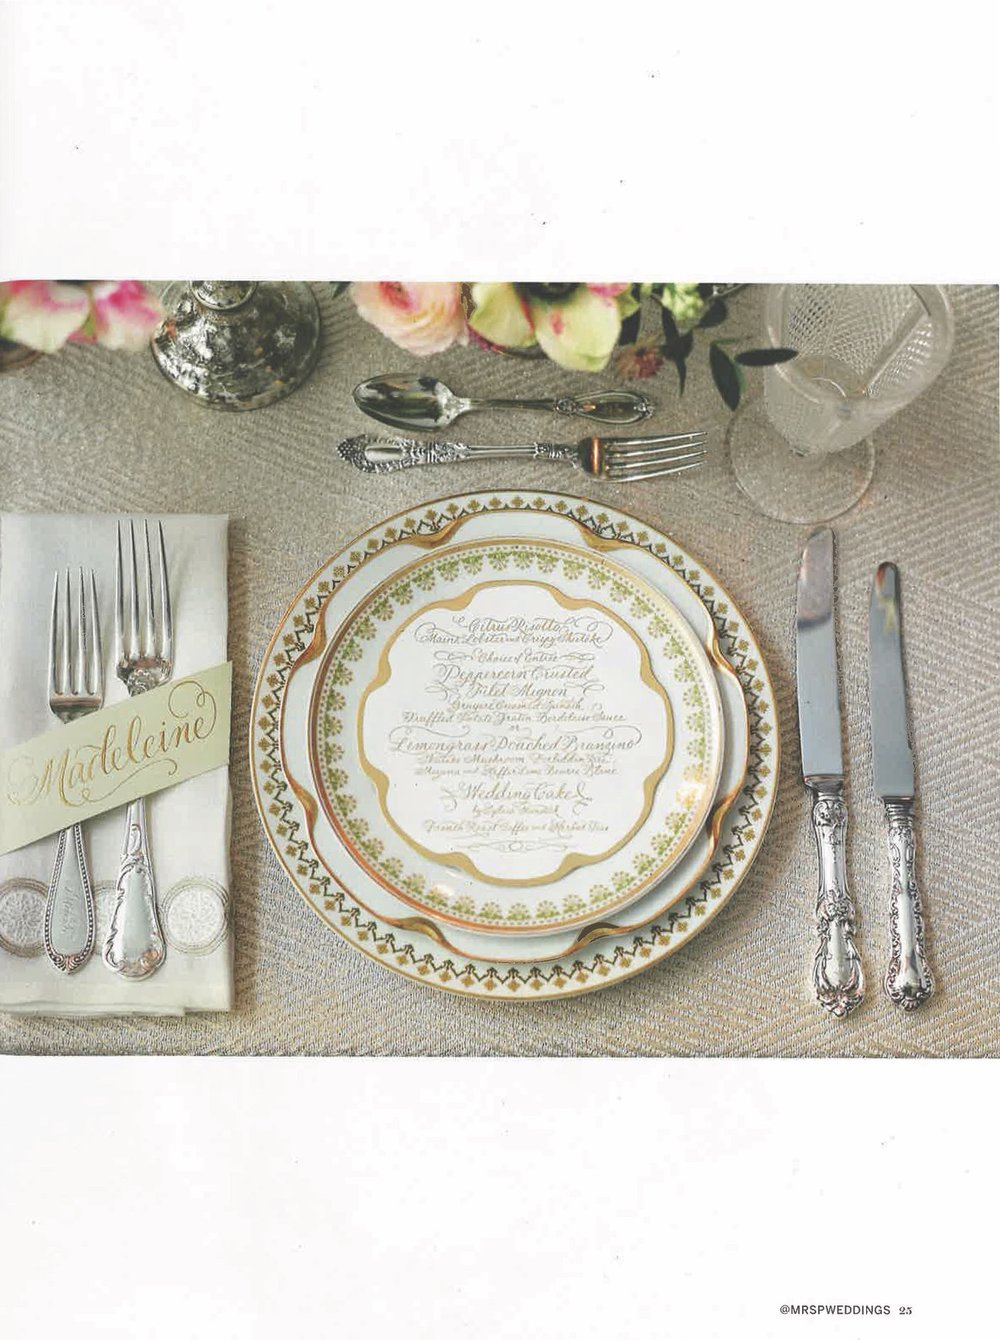 Weddings Matthew Robbins6.2017.jpg